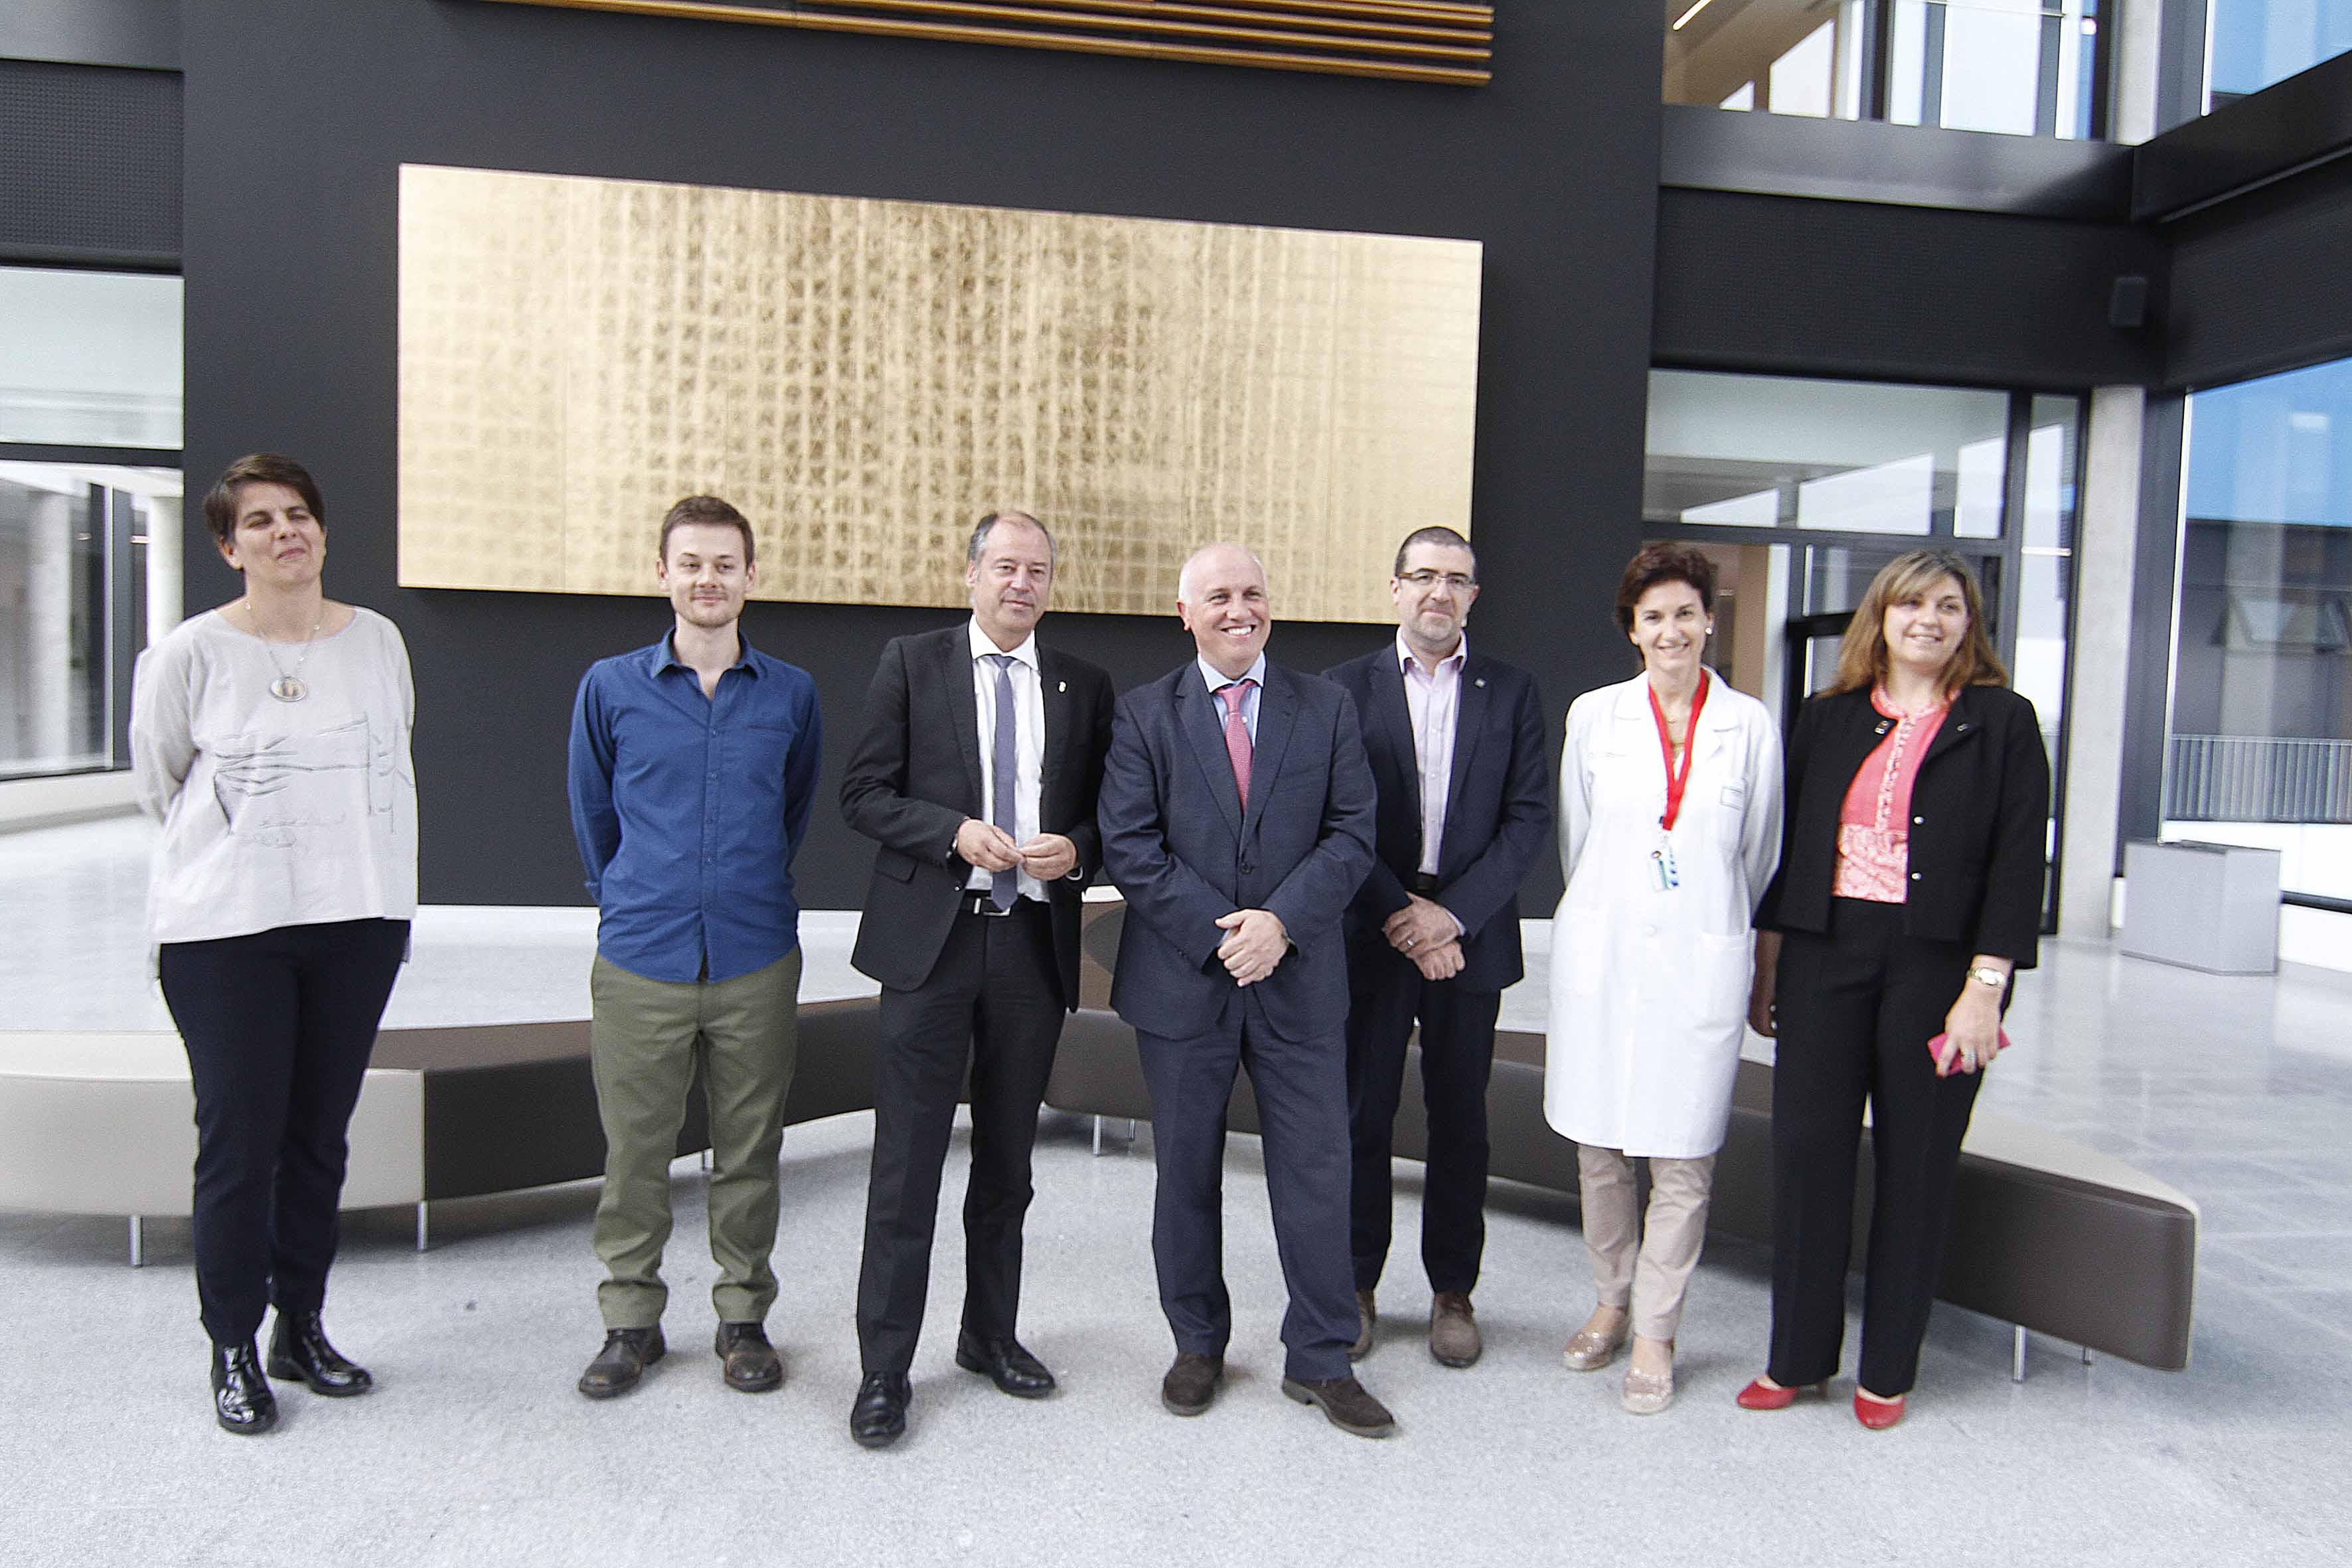 obra_Esmelle_preside_desde_hoxe_vestíbulo_principal_Hospital_Álvaro_Cunqueiro_Vigo